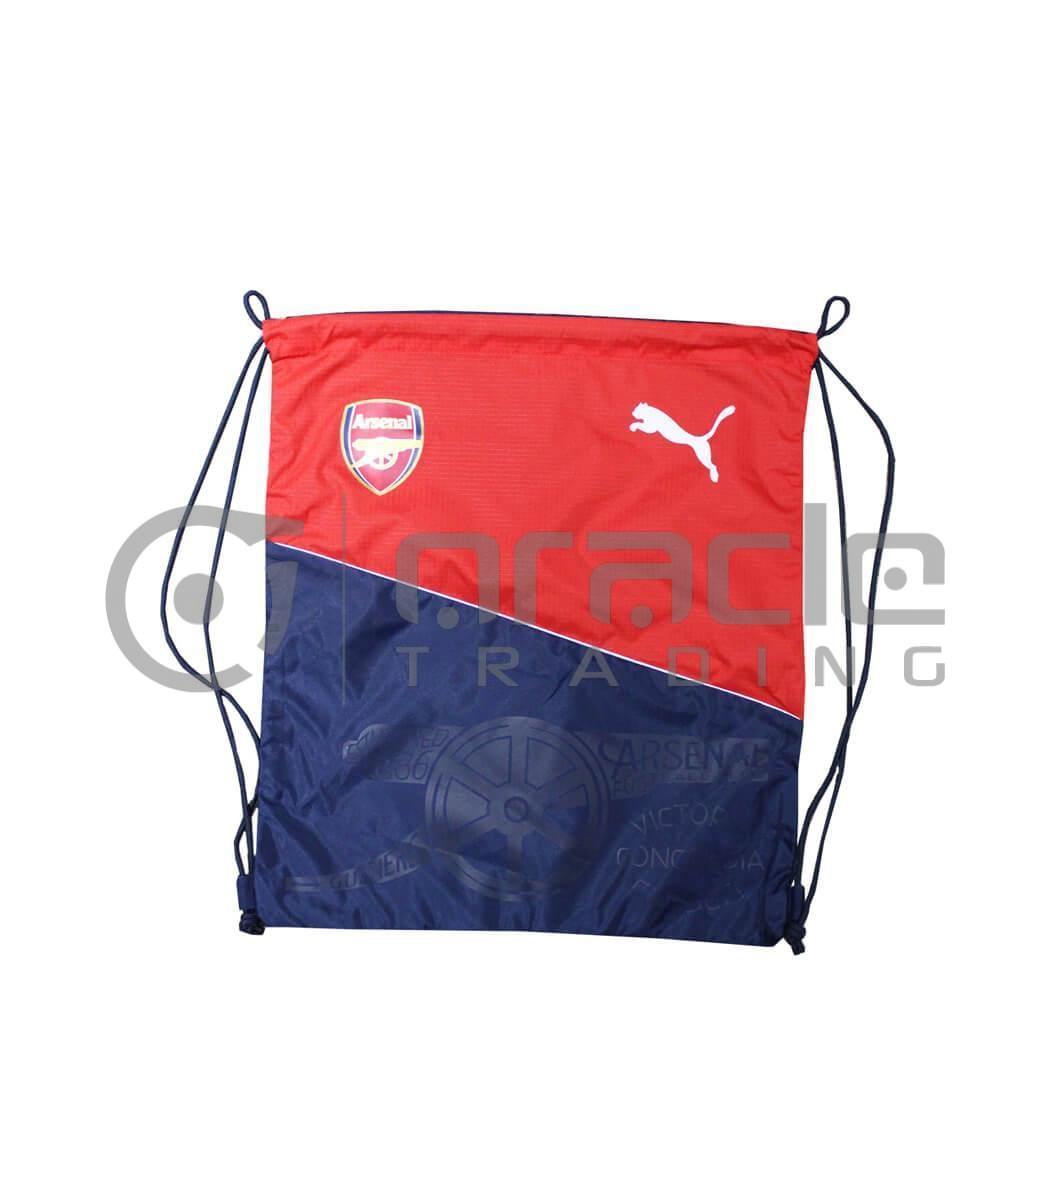 Arsenal Gym Bag - Puma